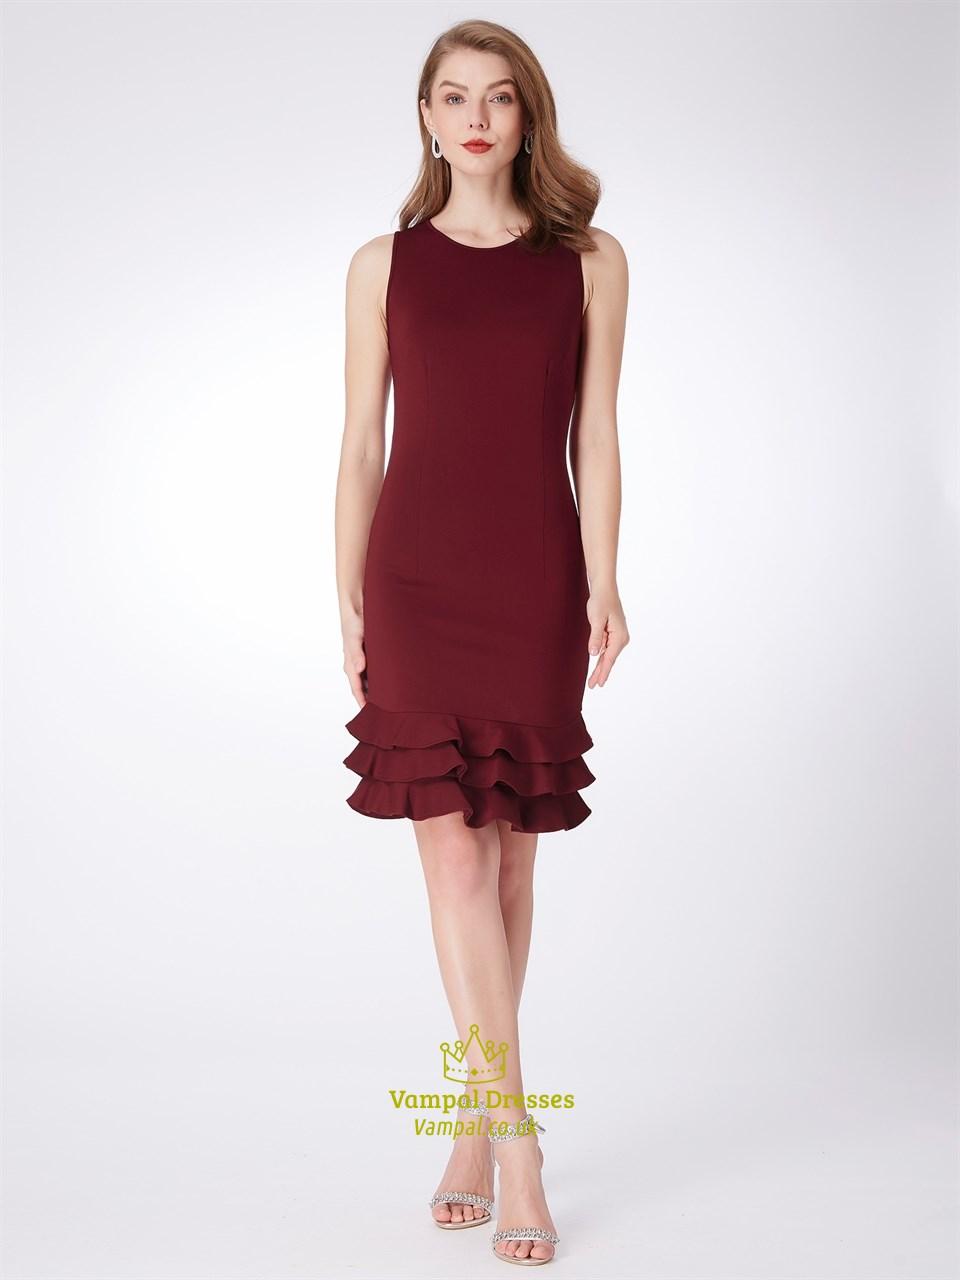 Simple Burgundy Jewel Neck Sleeveless Sheath Short Dress